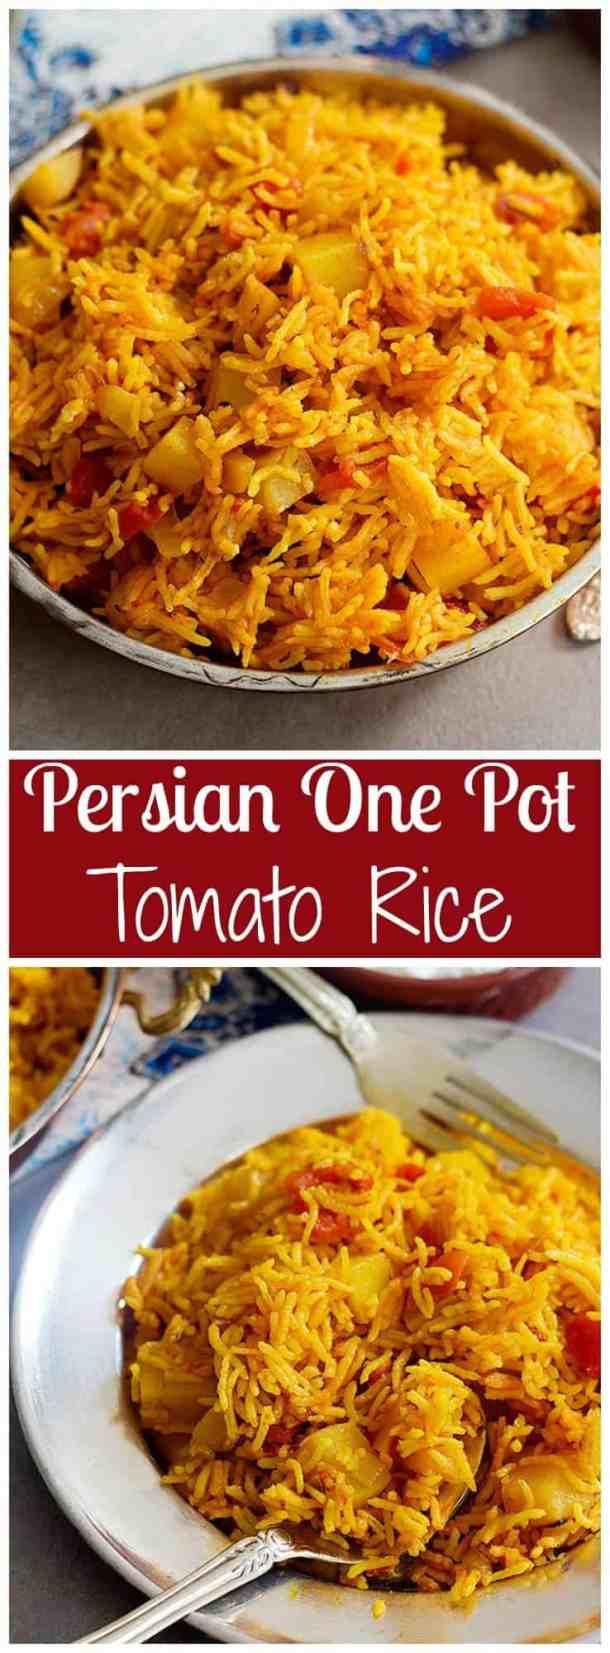 Tomato Rice | Tomato Rice Recipe | Persian Tomato Rice | Tomato Rice Recipe Simple | Tomato Rice Recipe Healthy | Persian Recipes | Mediterranean Recipes | Middle Eastern Recipes | One Pot Tomato Rice | One Pot Rice | One Pot Recipes | UnicornsintheKitchen.com